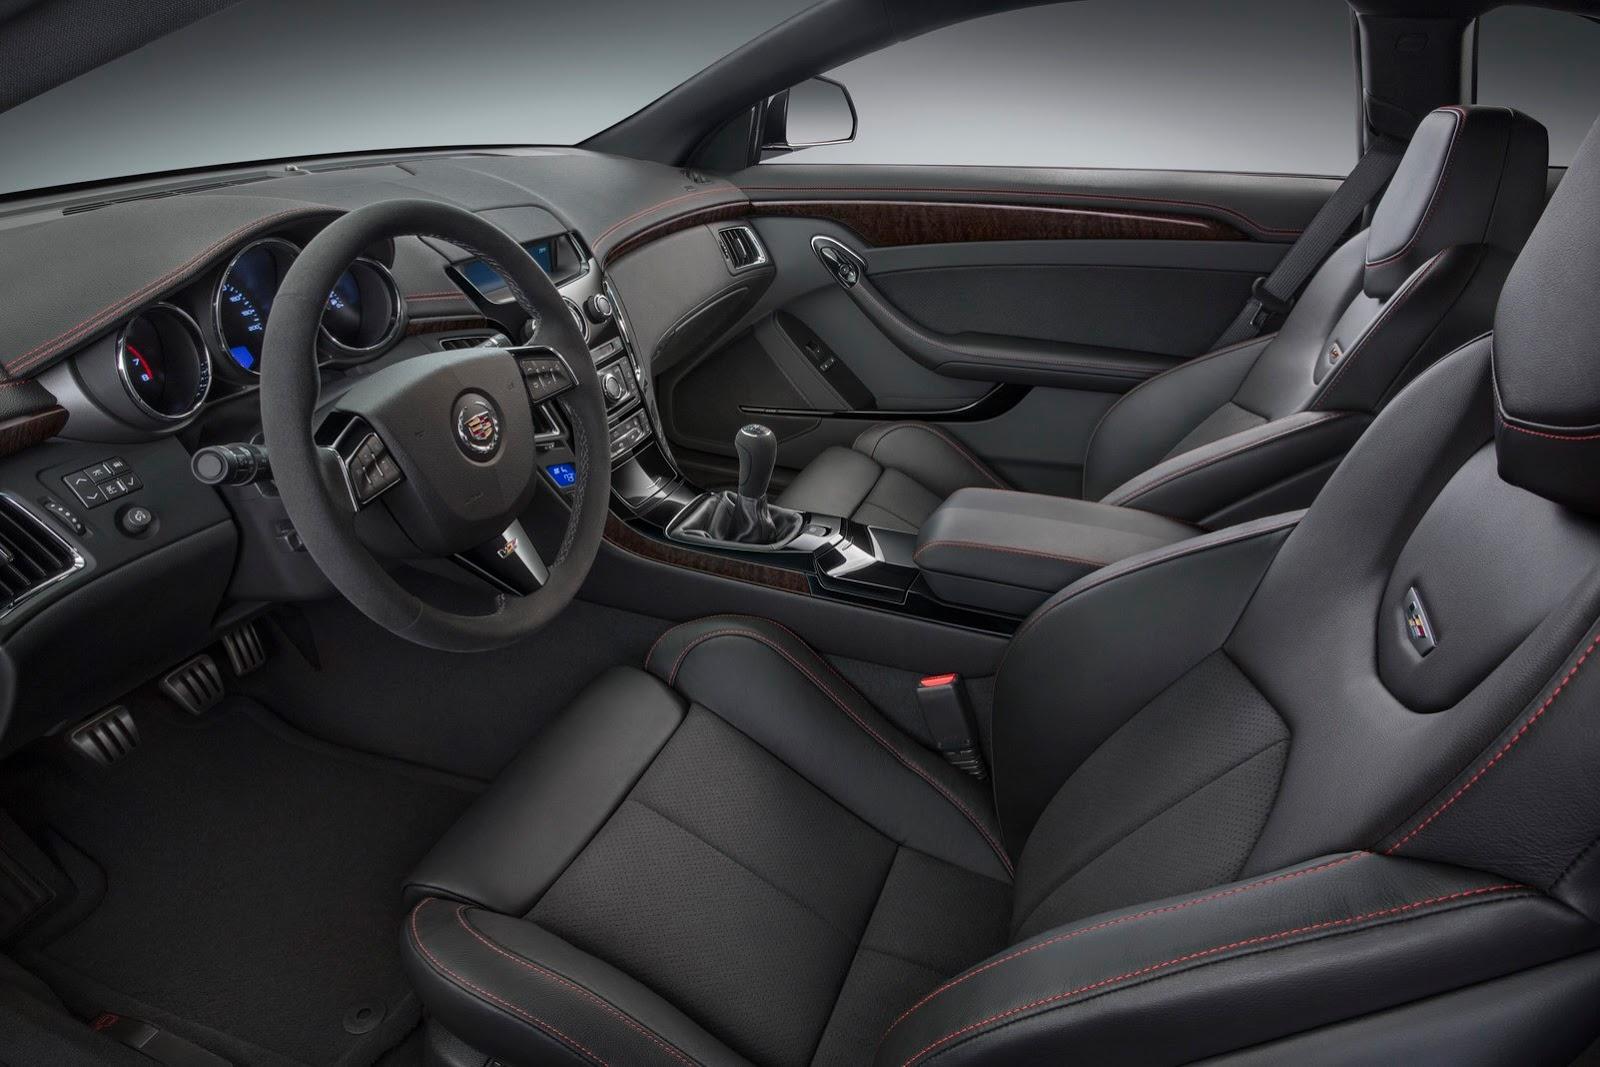 2010 - [Cadillac] CTS-V Coupé - Page 3 2015-Cadillac-CTSV-Coupe-4%25255B2%25255D